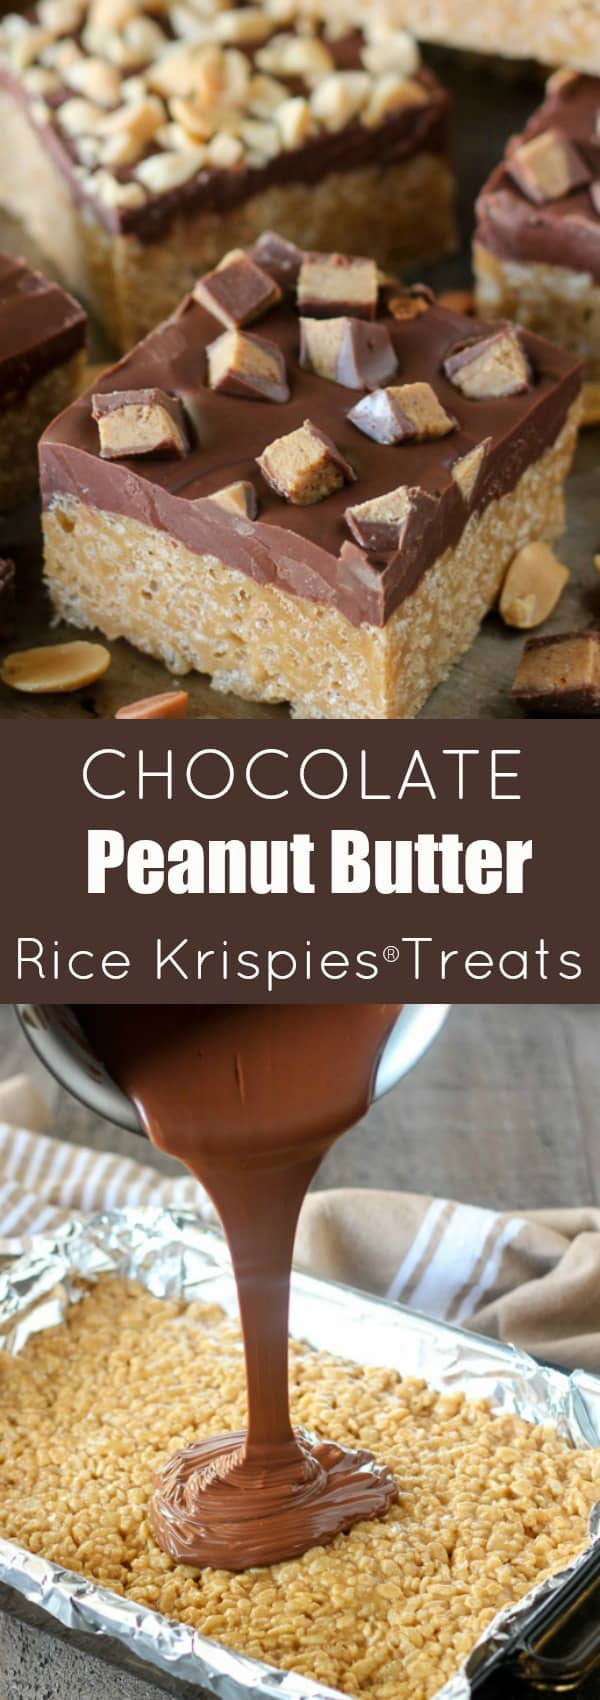 Chocolate Peanut Butter Rice Krispies Treats